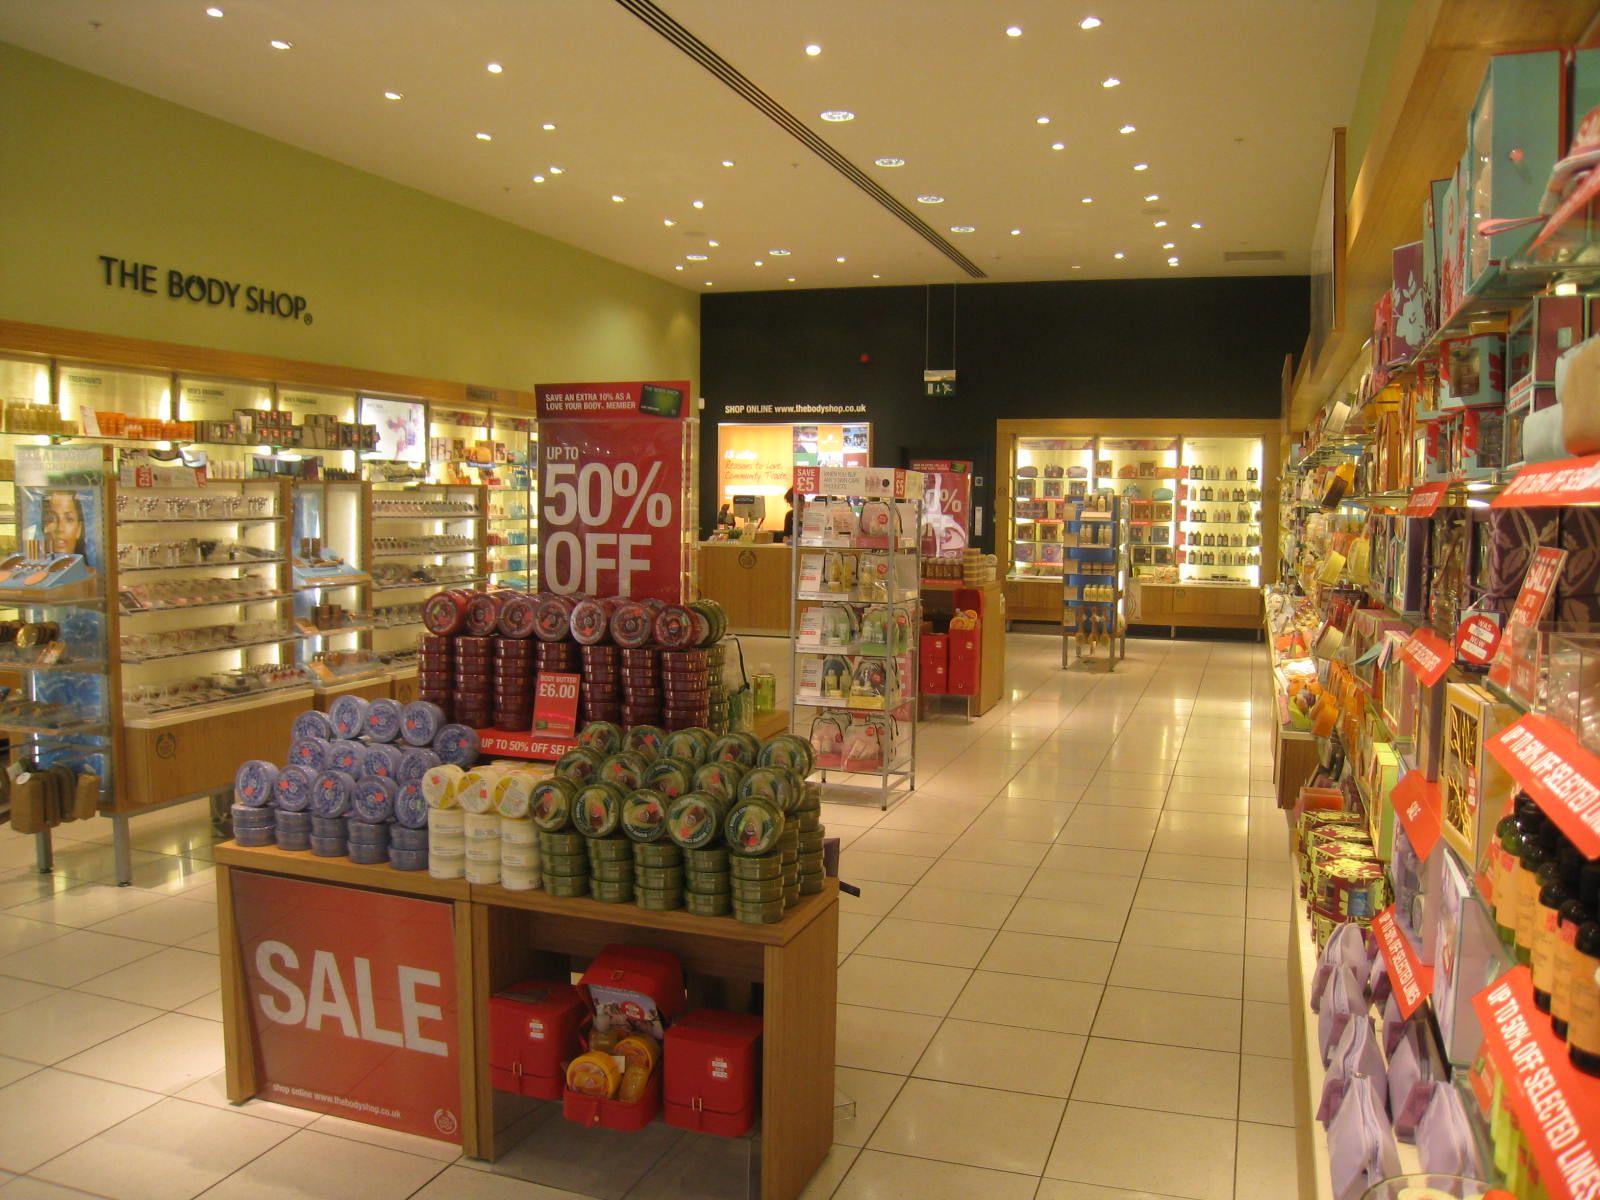 The Body Shop Interior Design